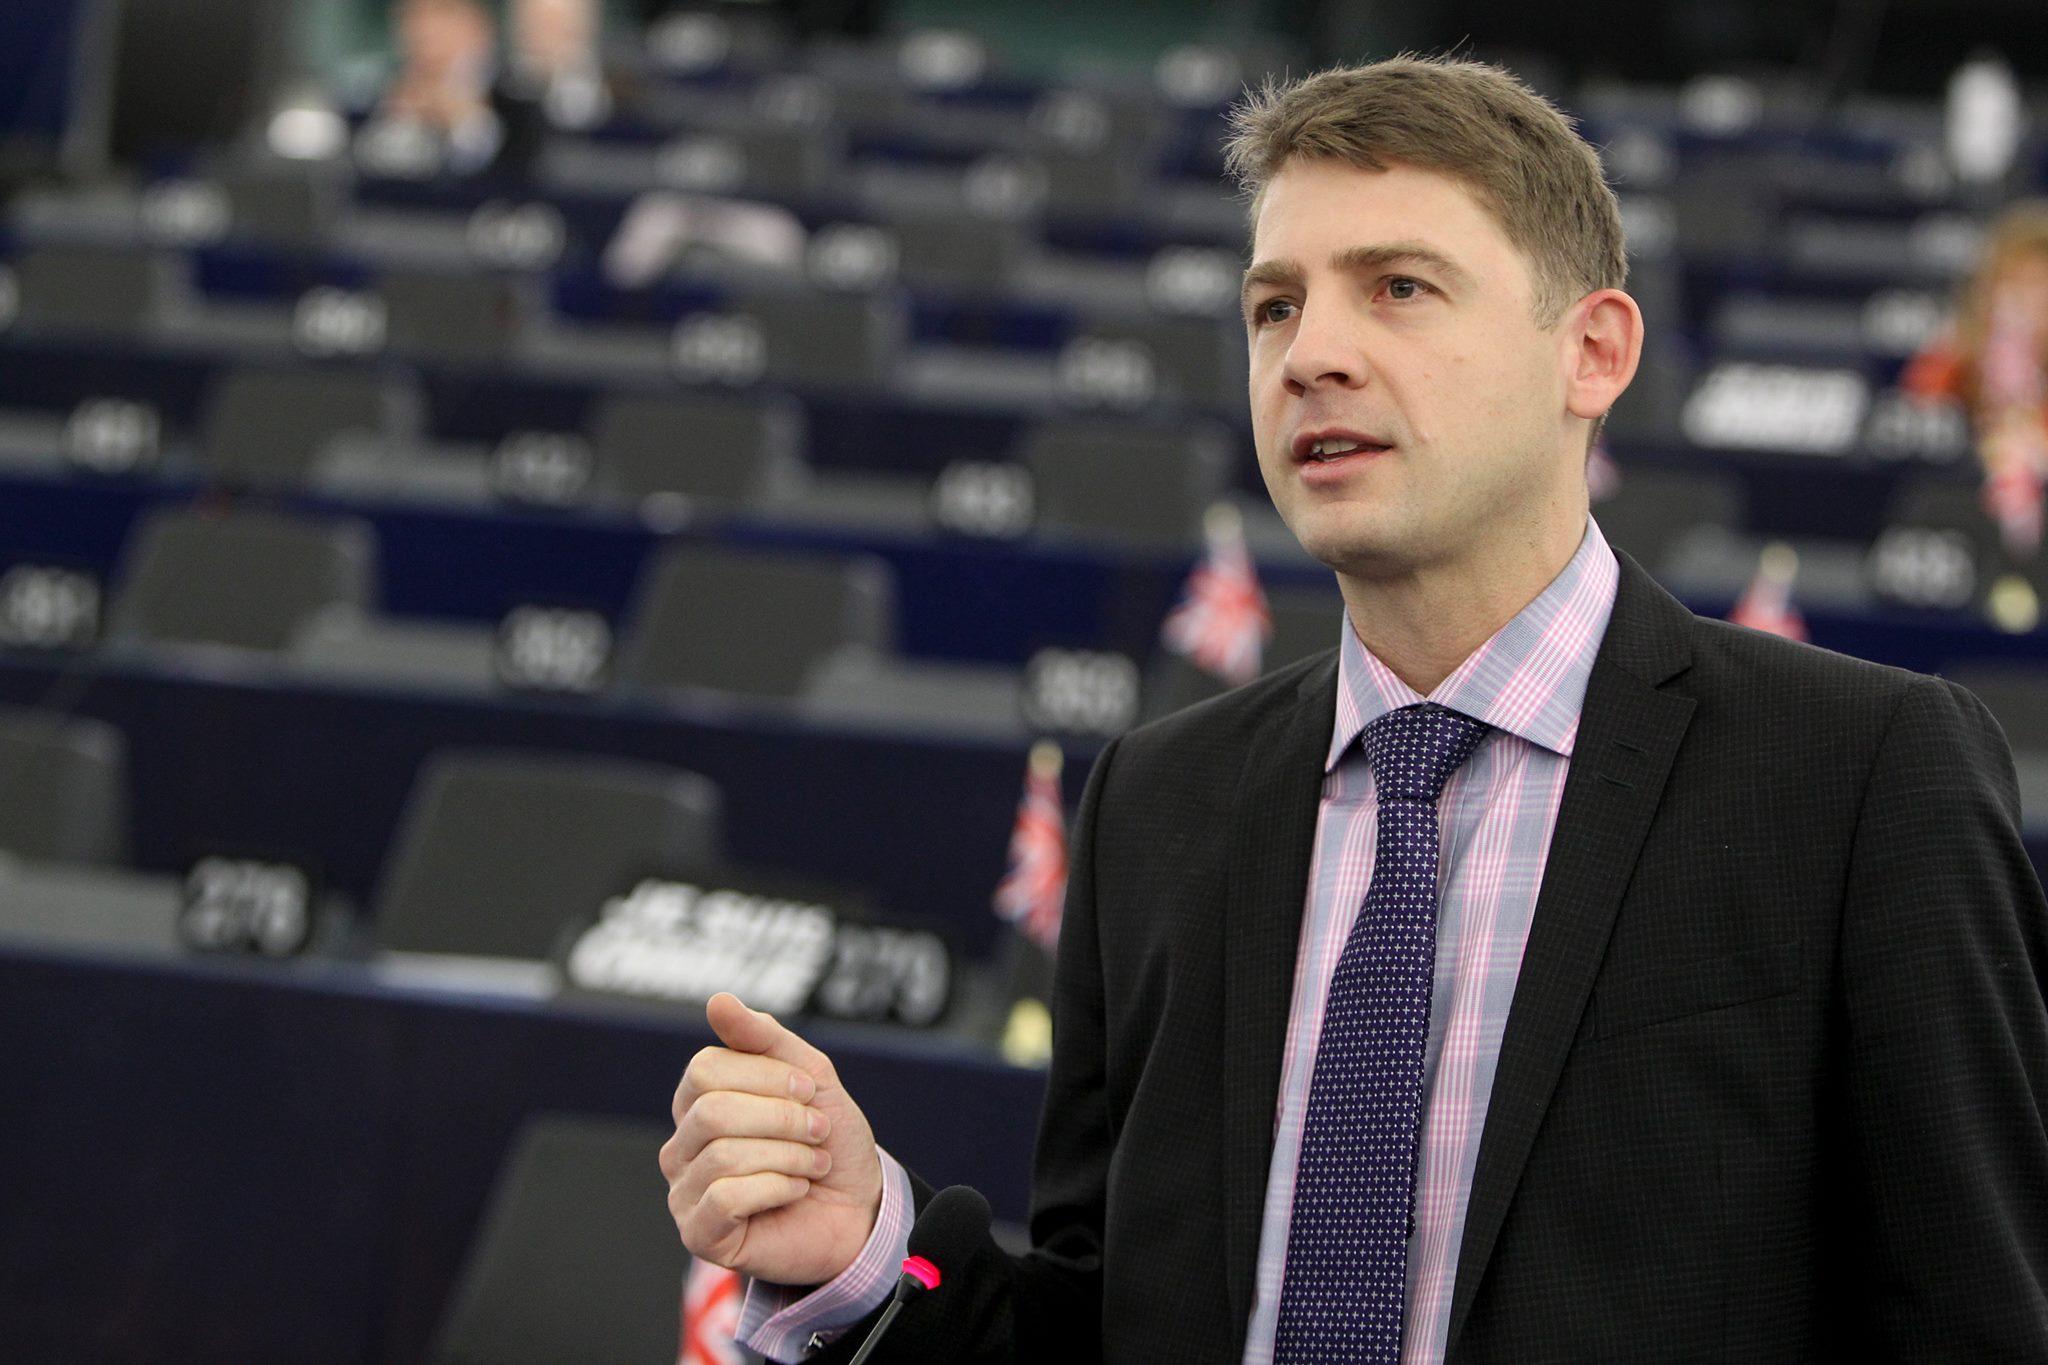 Petr Mach s kolegy z EFDD opět navrhuje úspory v rozpočtu EU